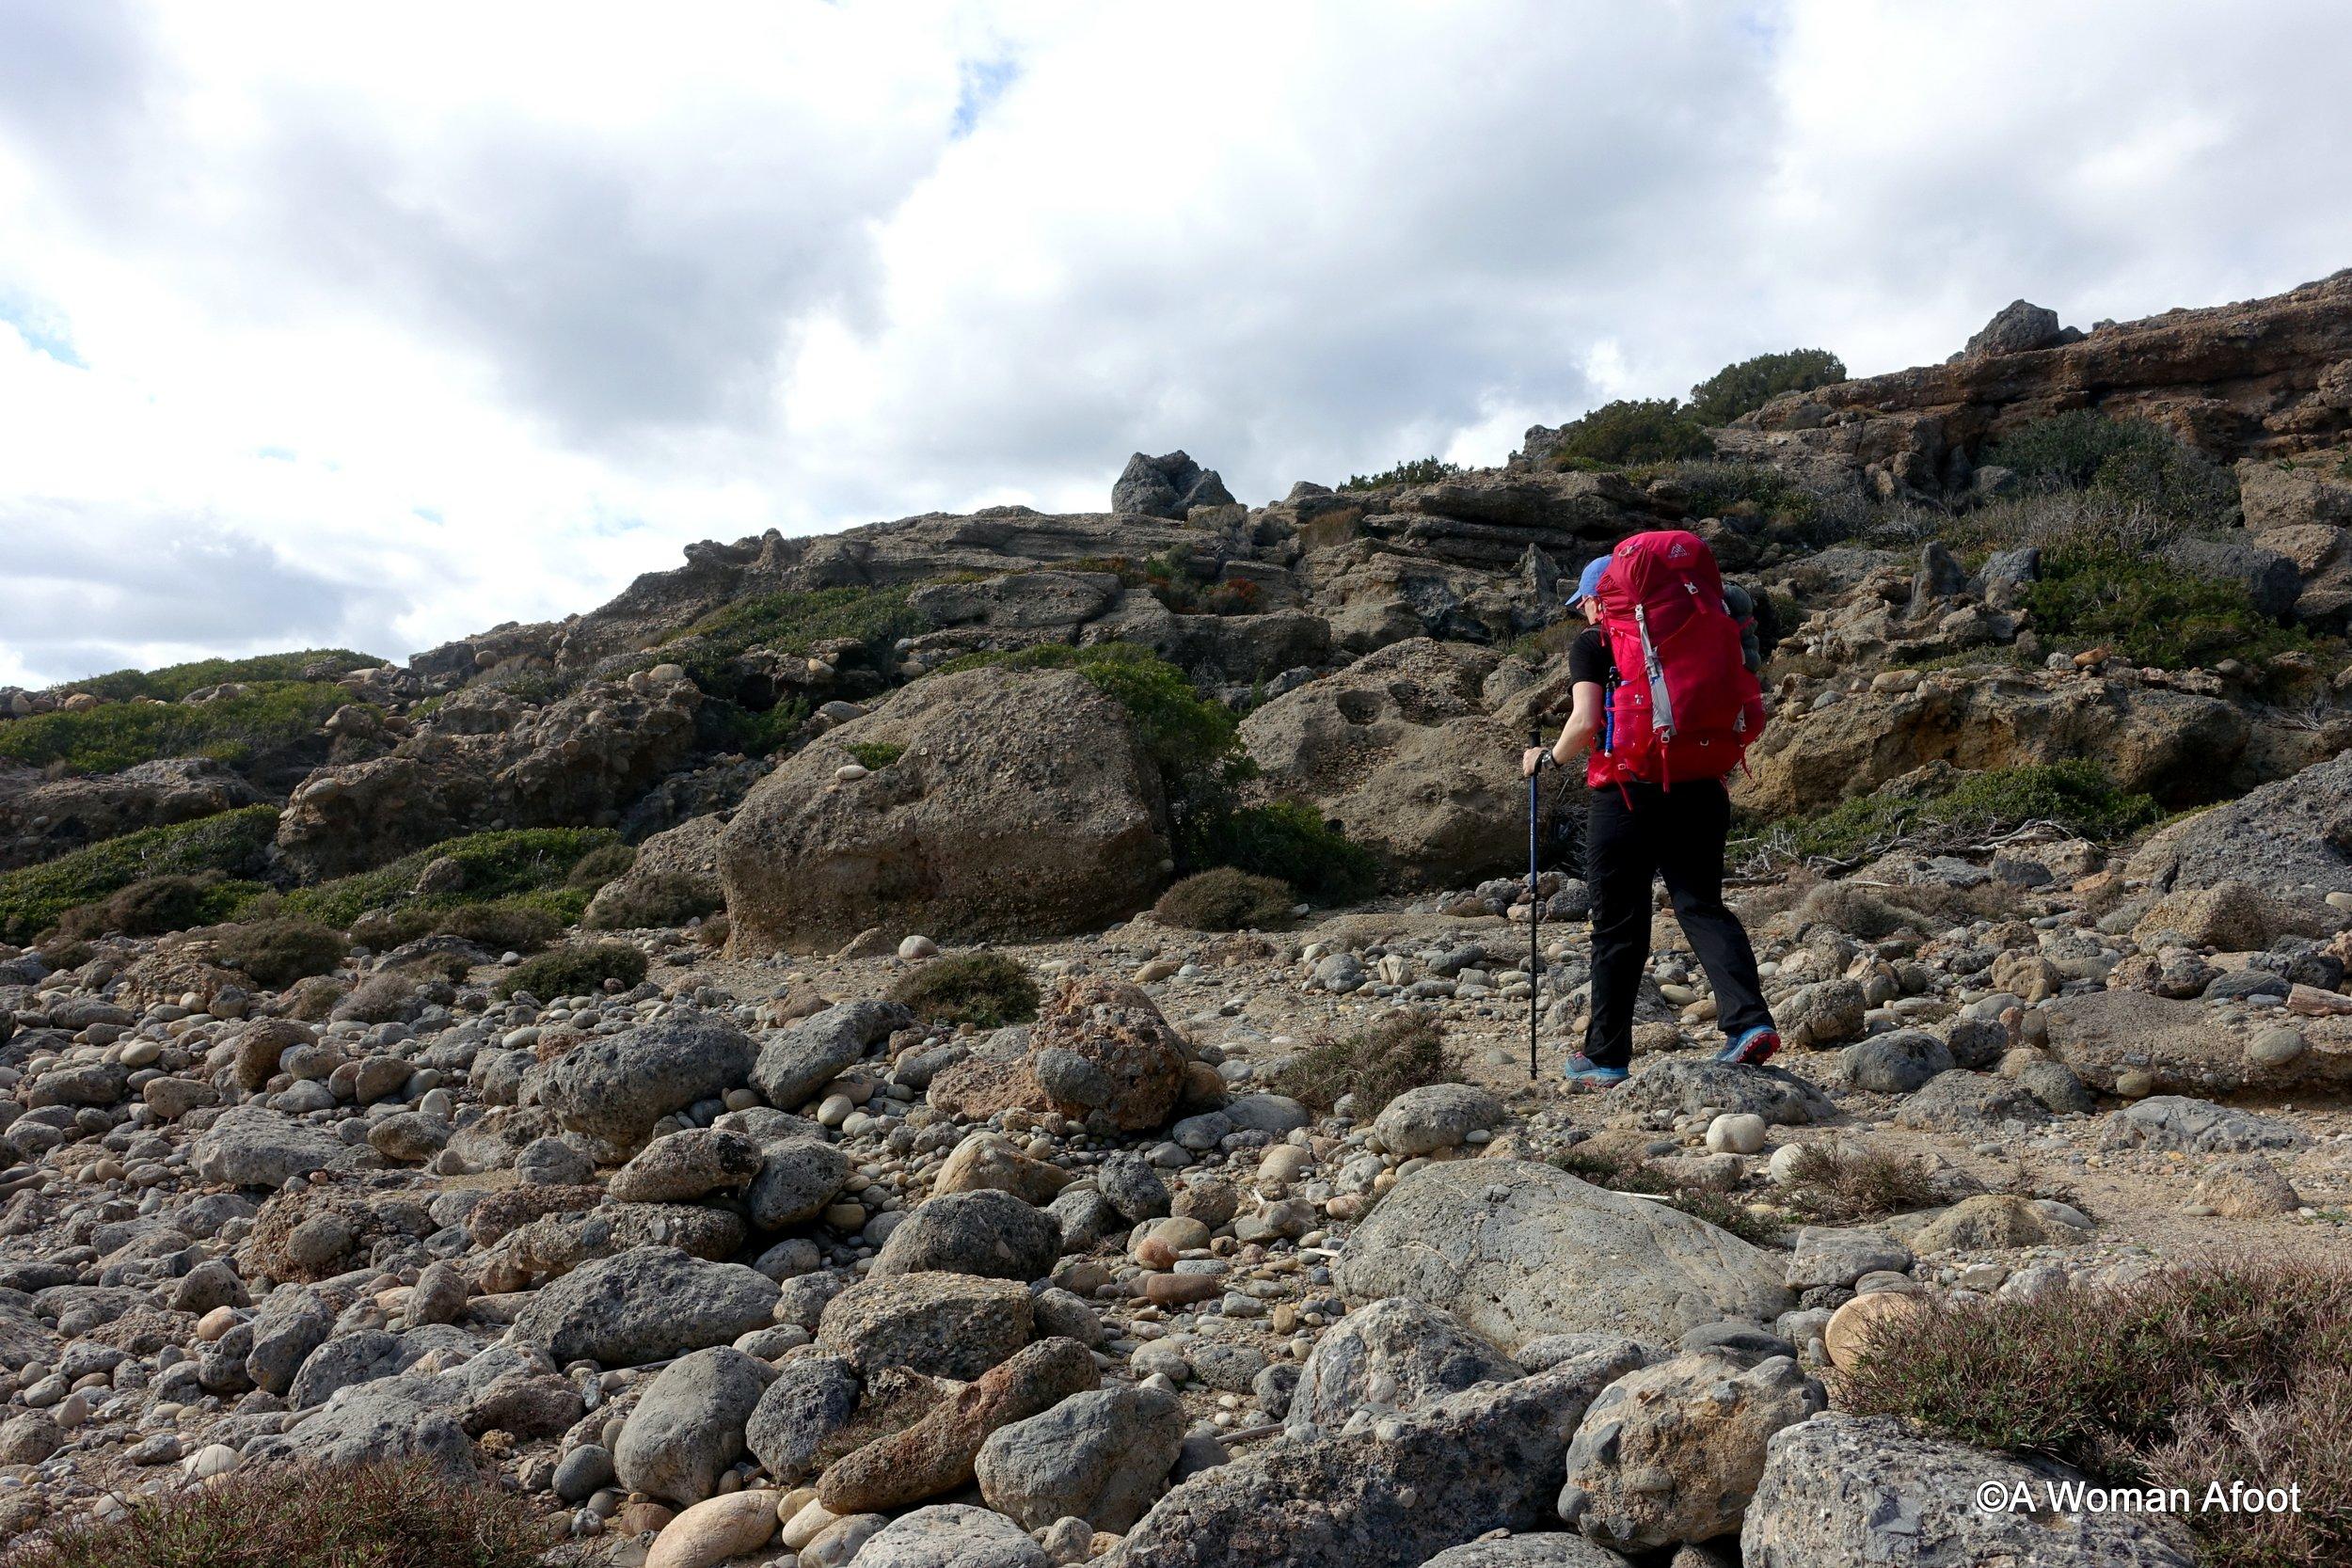 ultra-light hiking gear lightweight gear gregory backpack